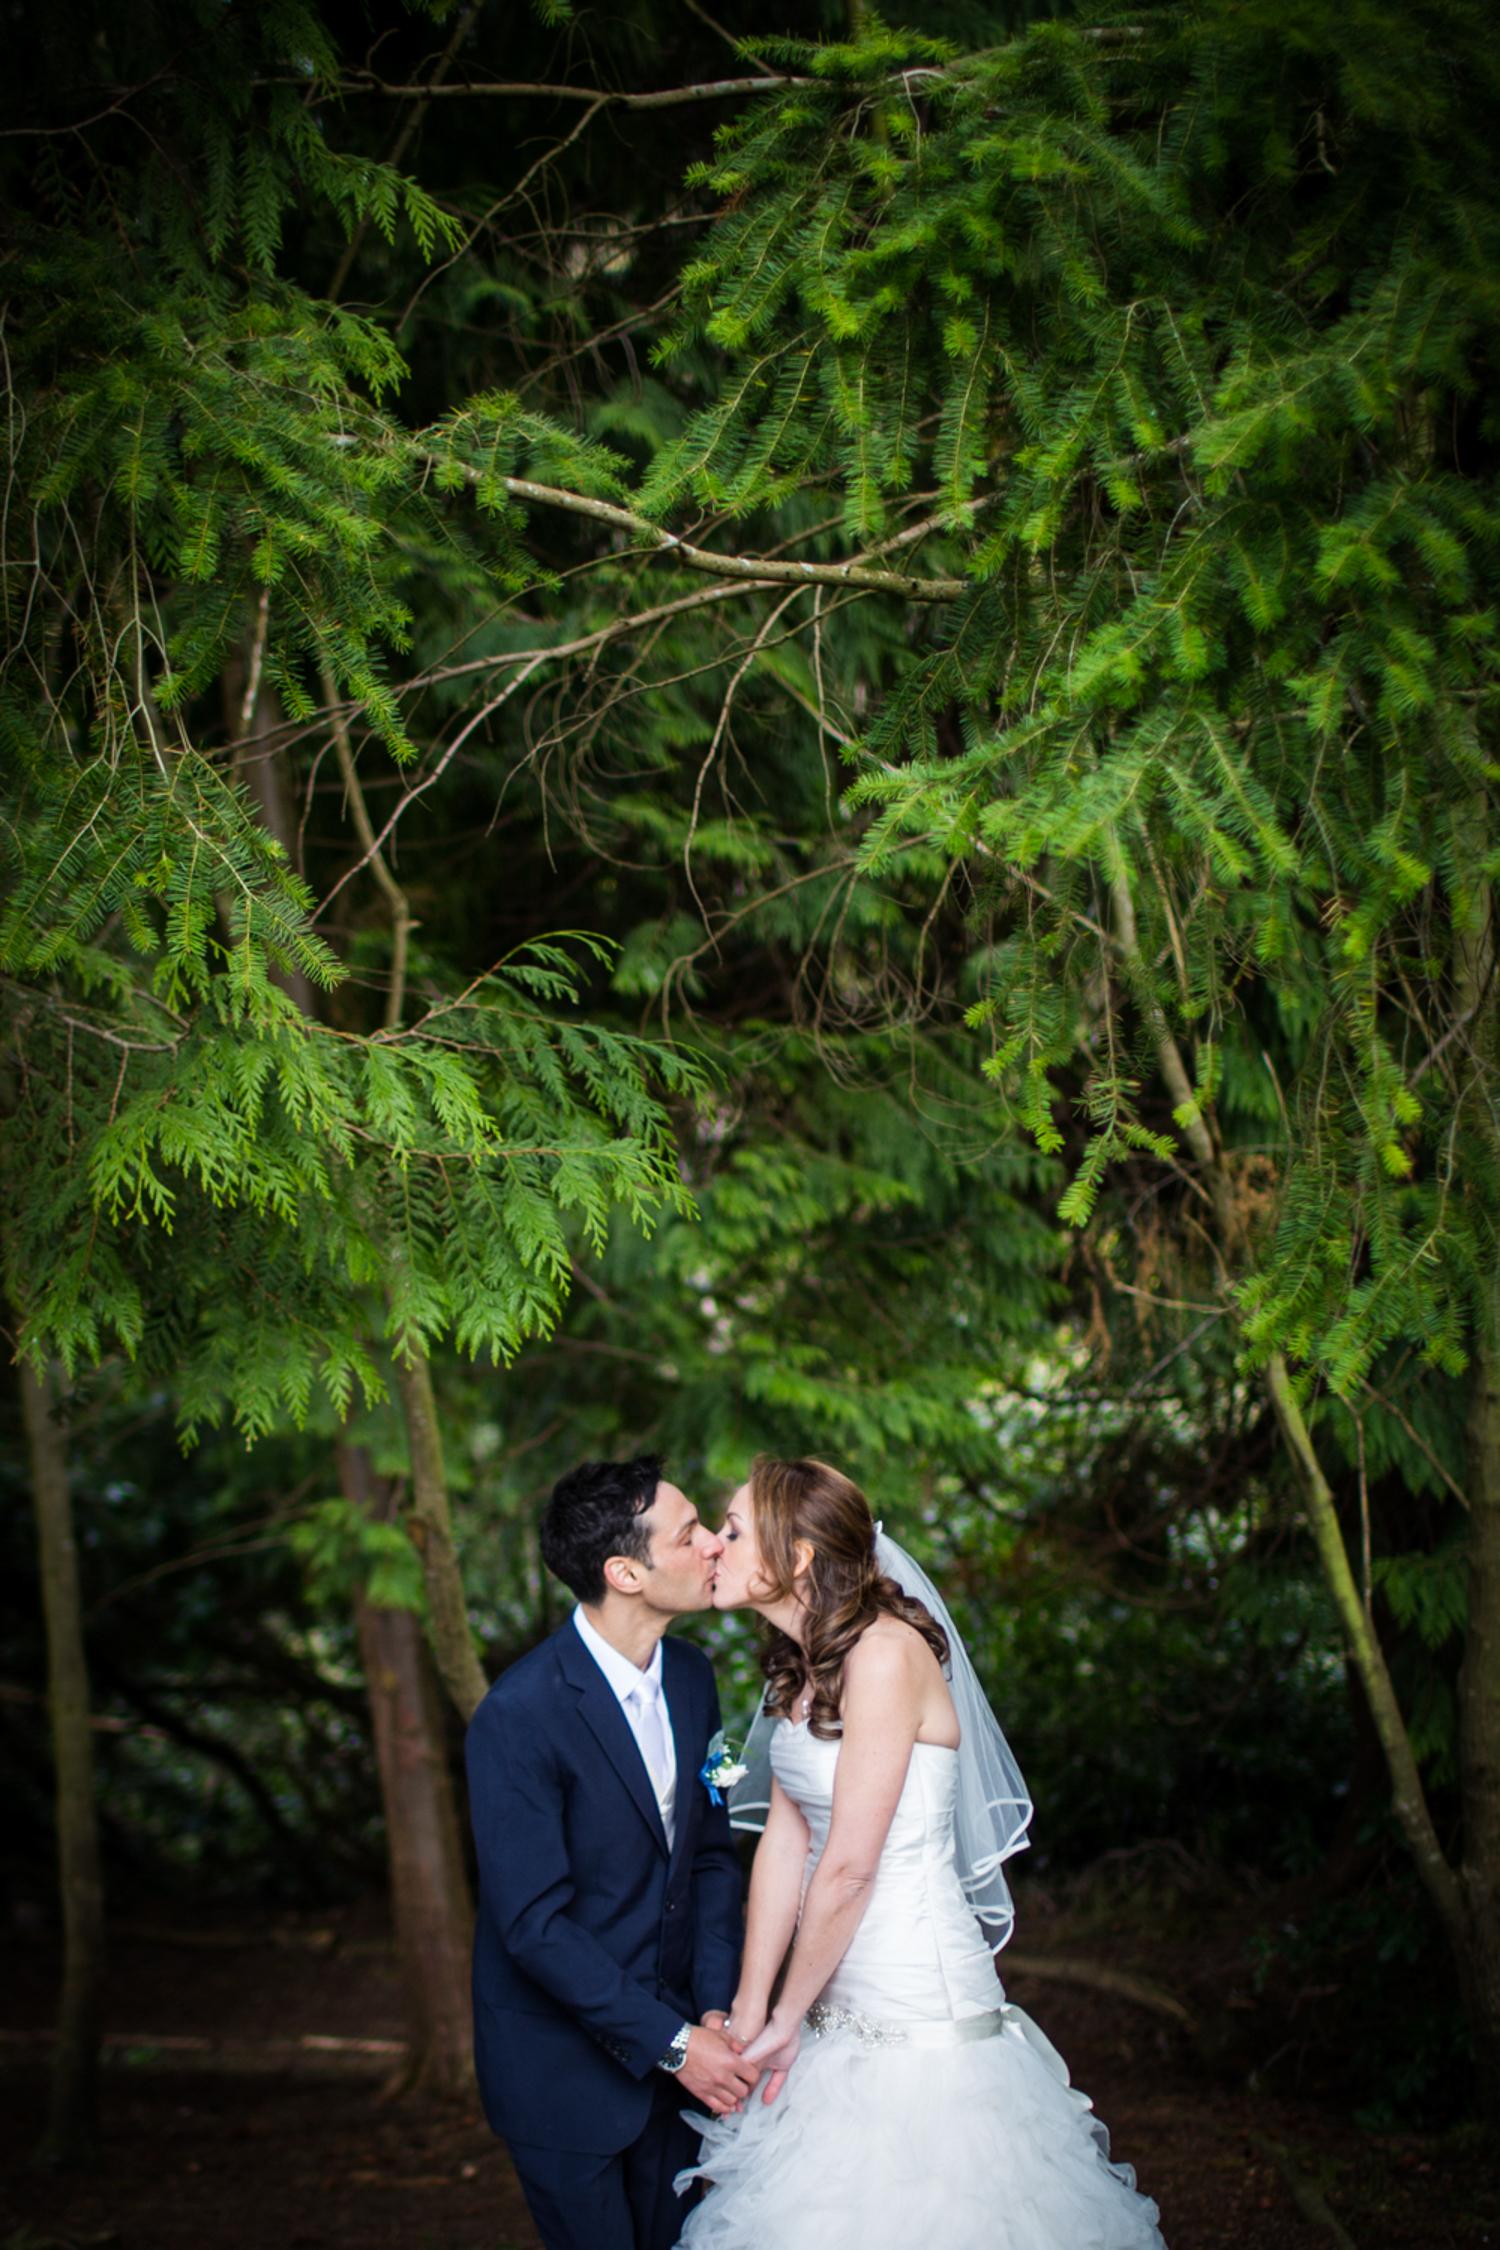 Sara and Ben's wedding day-1-2.jpg